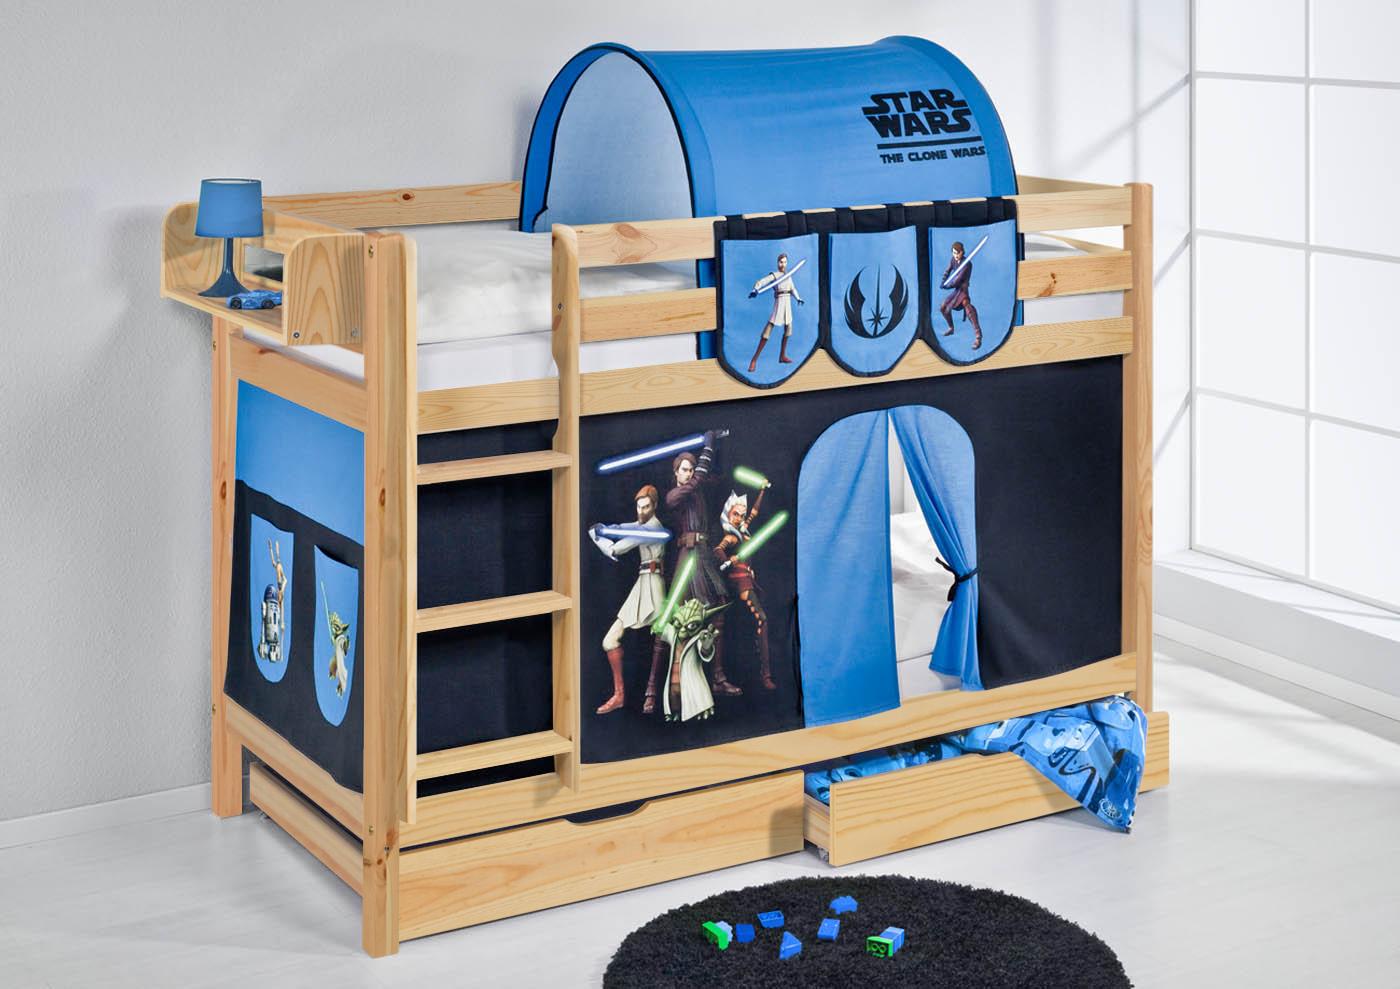 etagenbett hochbett kinder bett aus massiver kiefer jelle. Black Bedroom Furniture Sets. Home Design Ideas